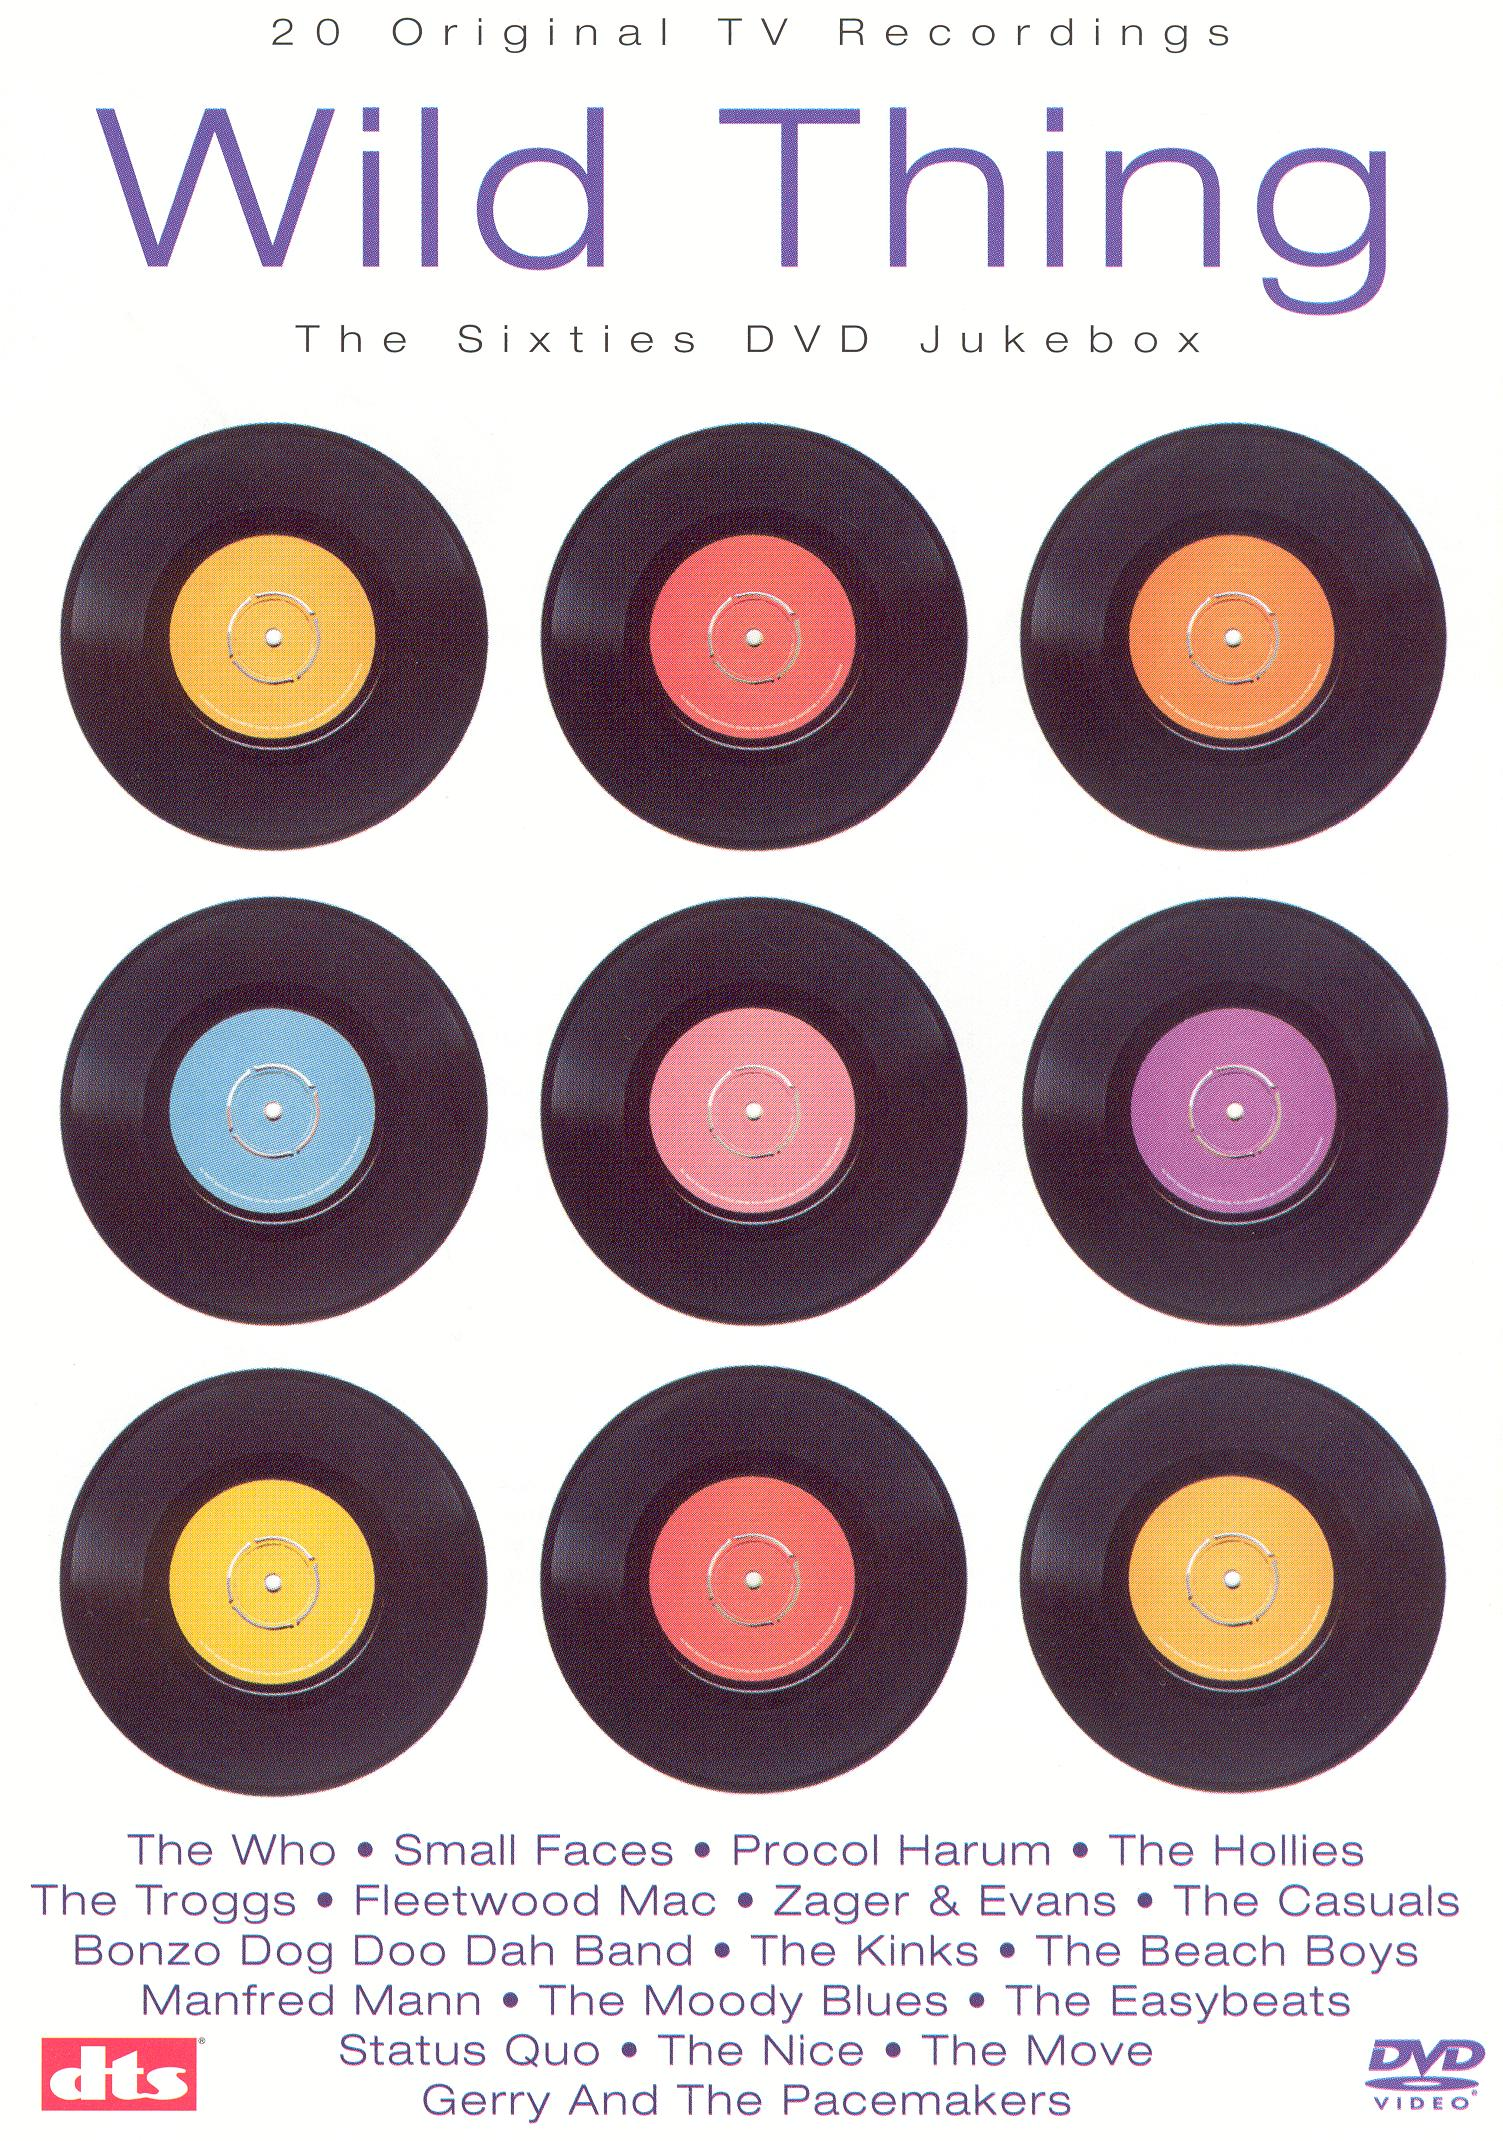 Wild Thing: The Sixties DVD Jukebox